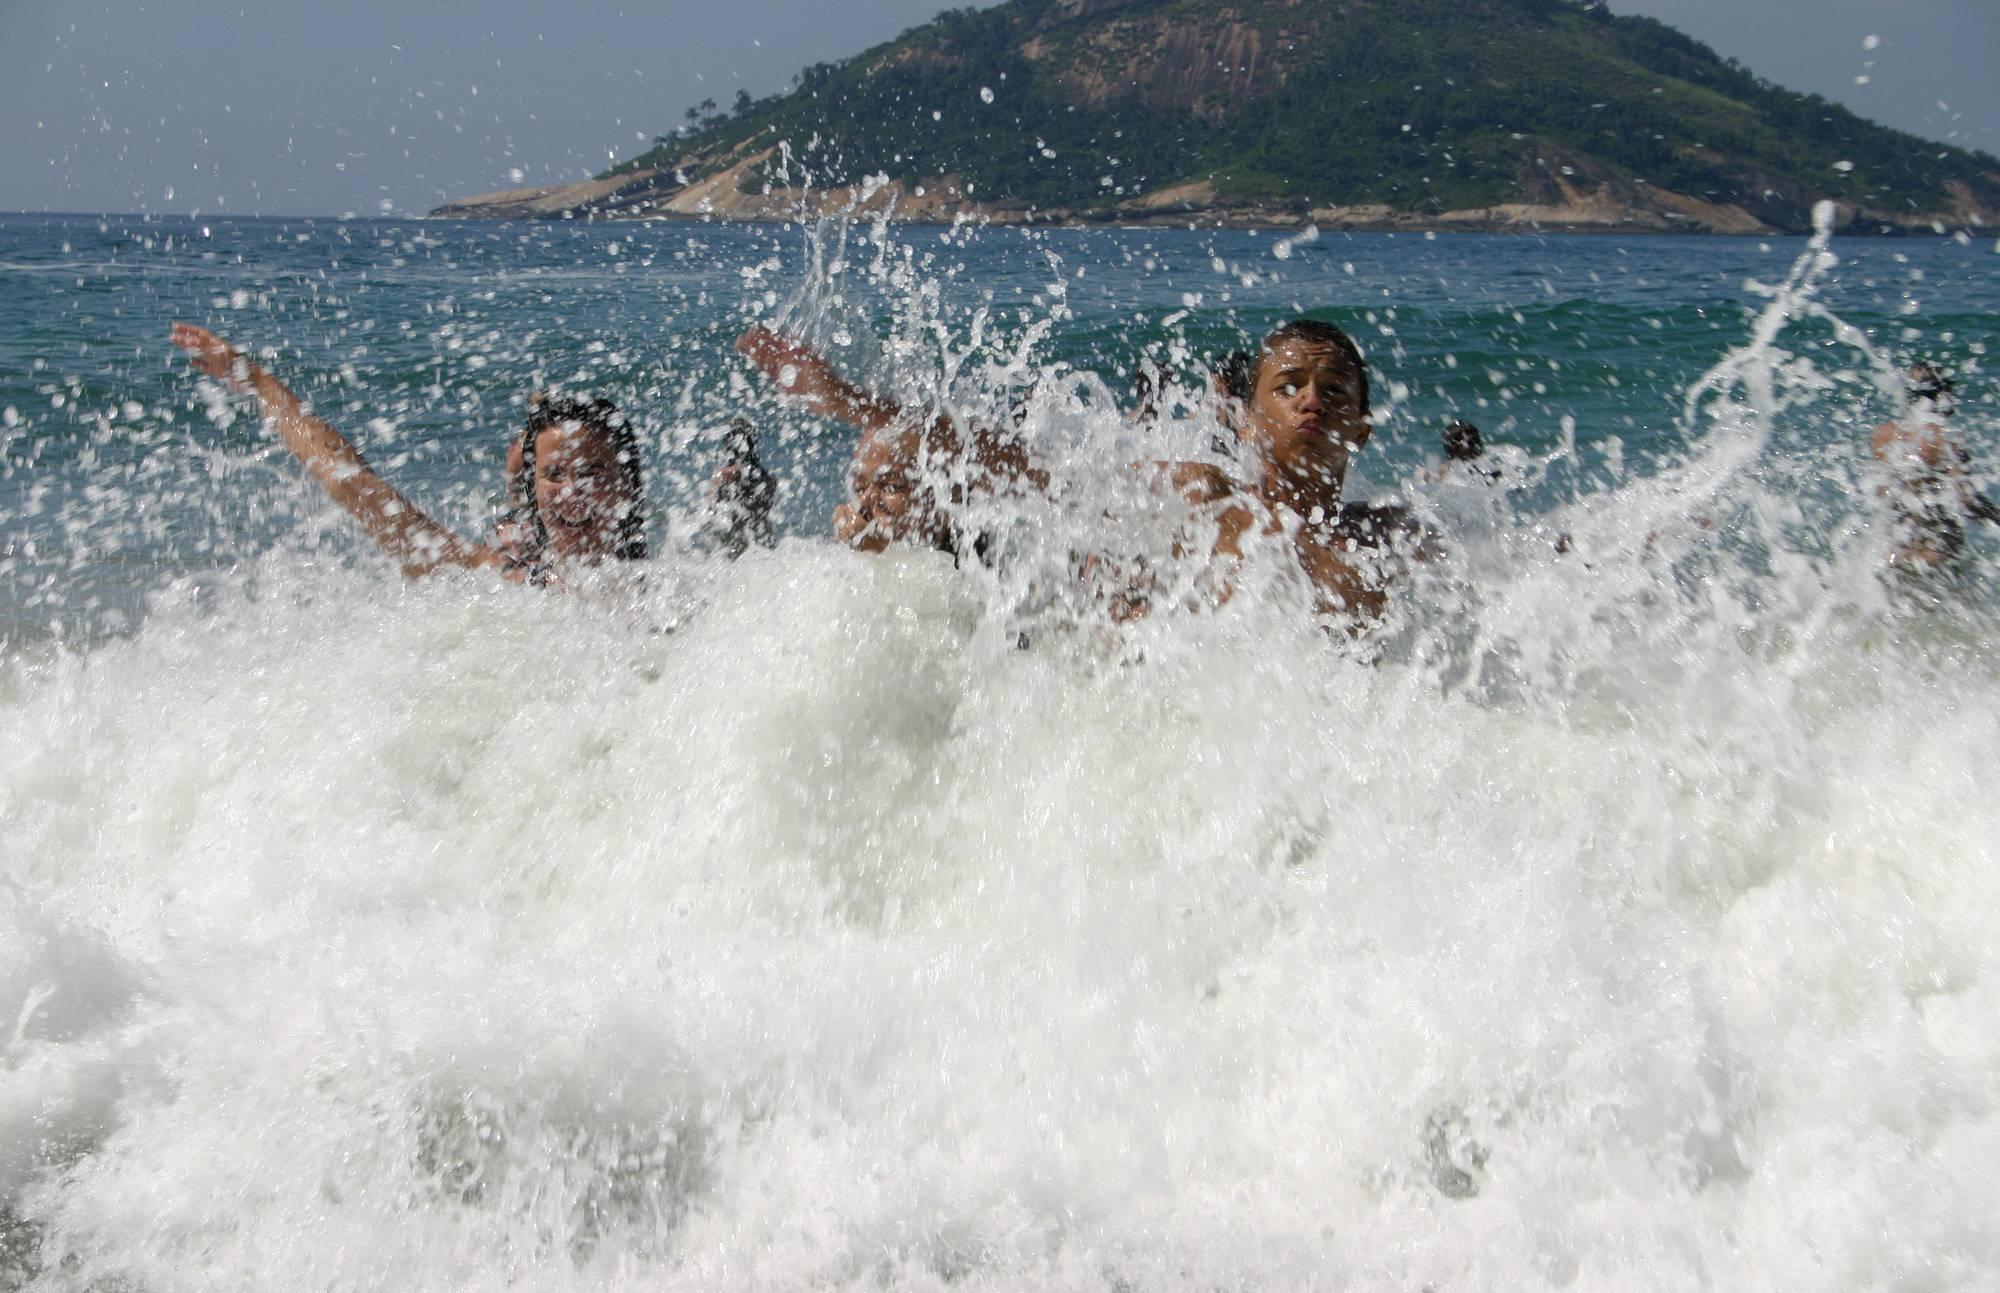 Pure Nudism Pics-Brazilian Water Splashing - 2